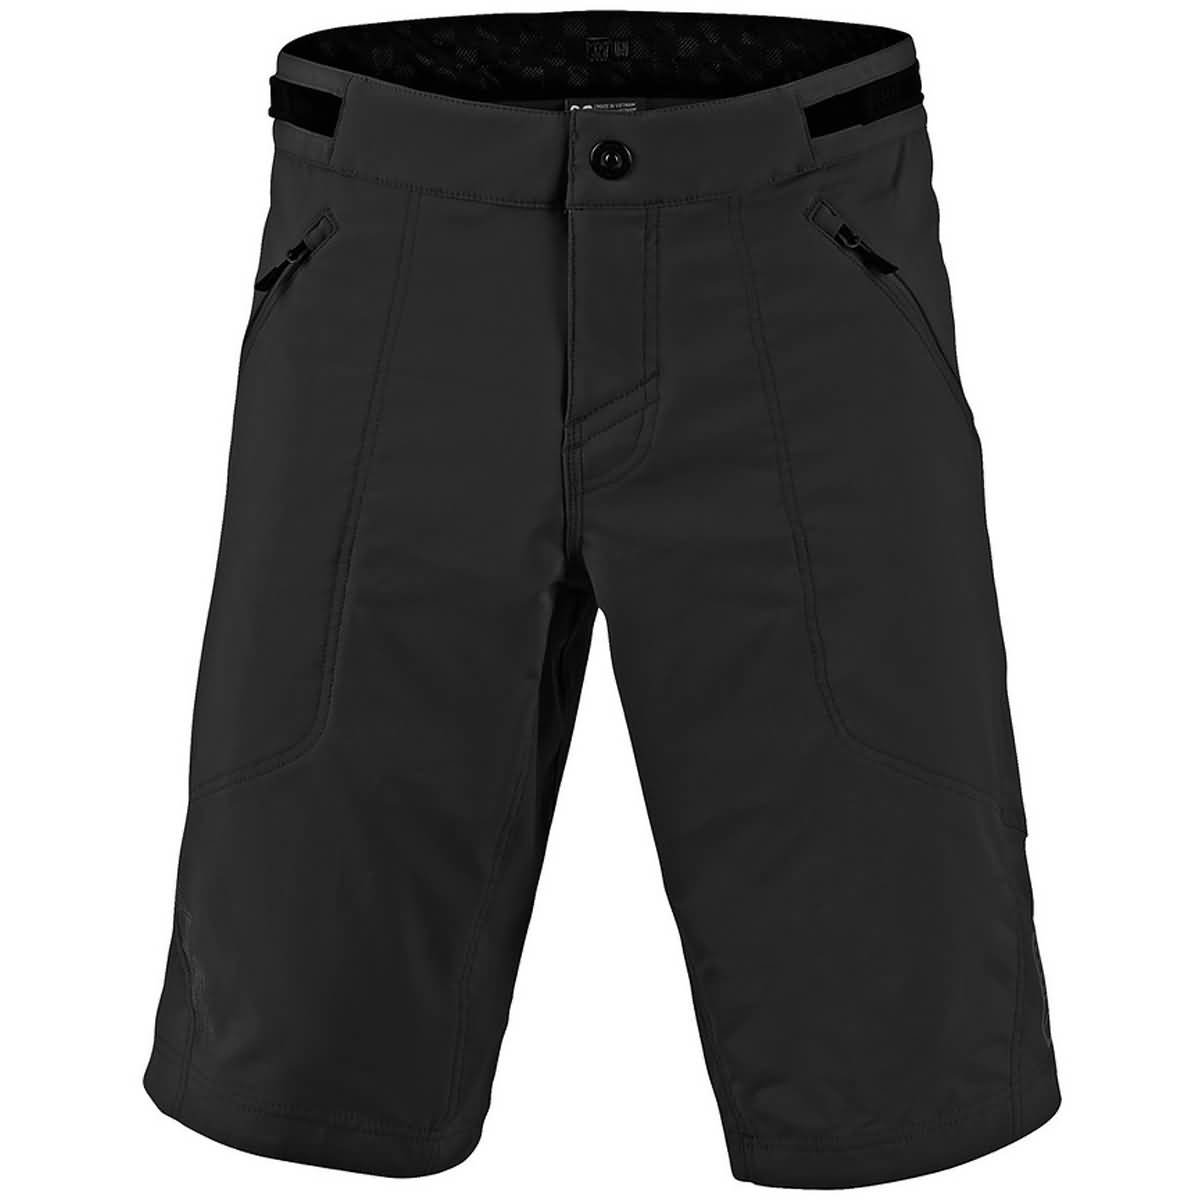 Troy Lee Designs Skyline Short - Boys' Solid Black, 22 by Troy Lee Designs